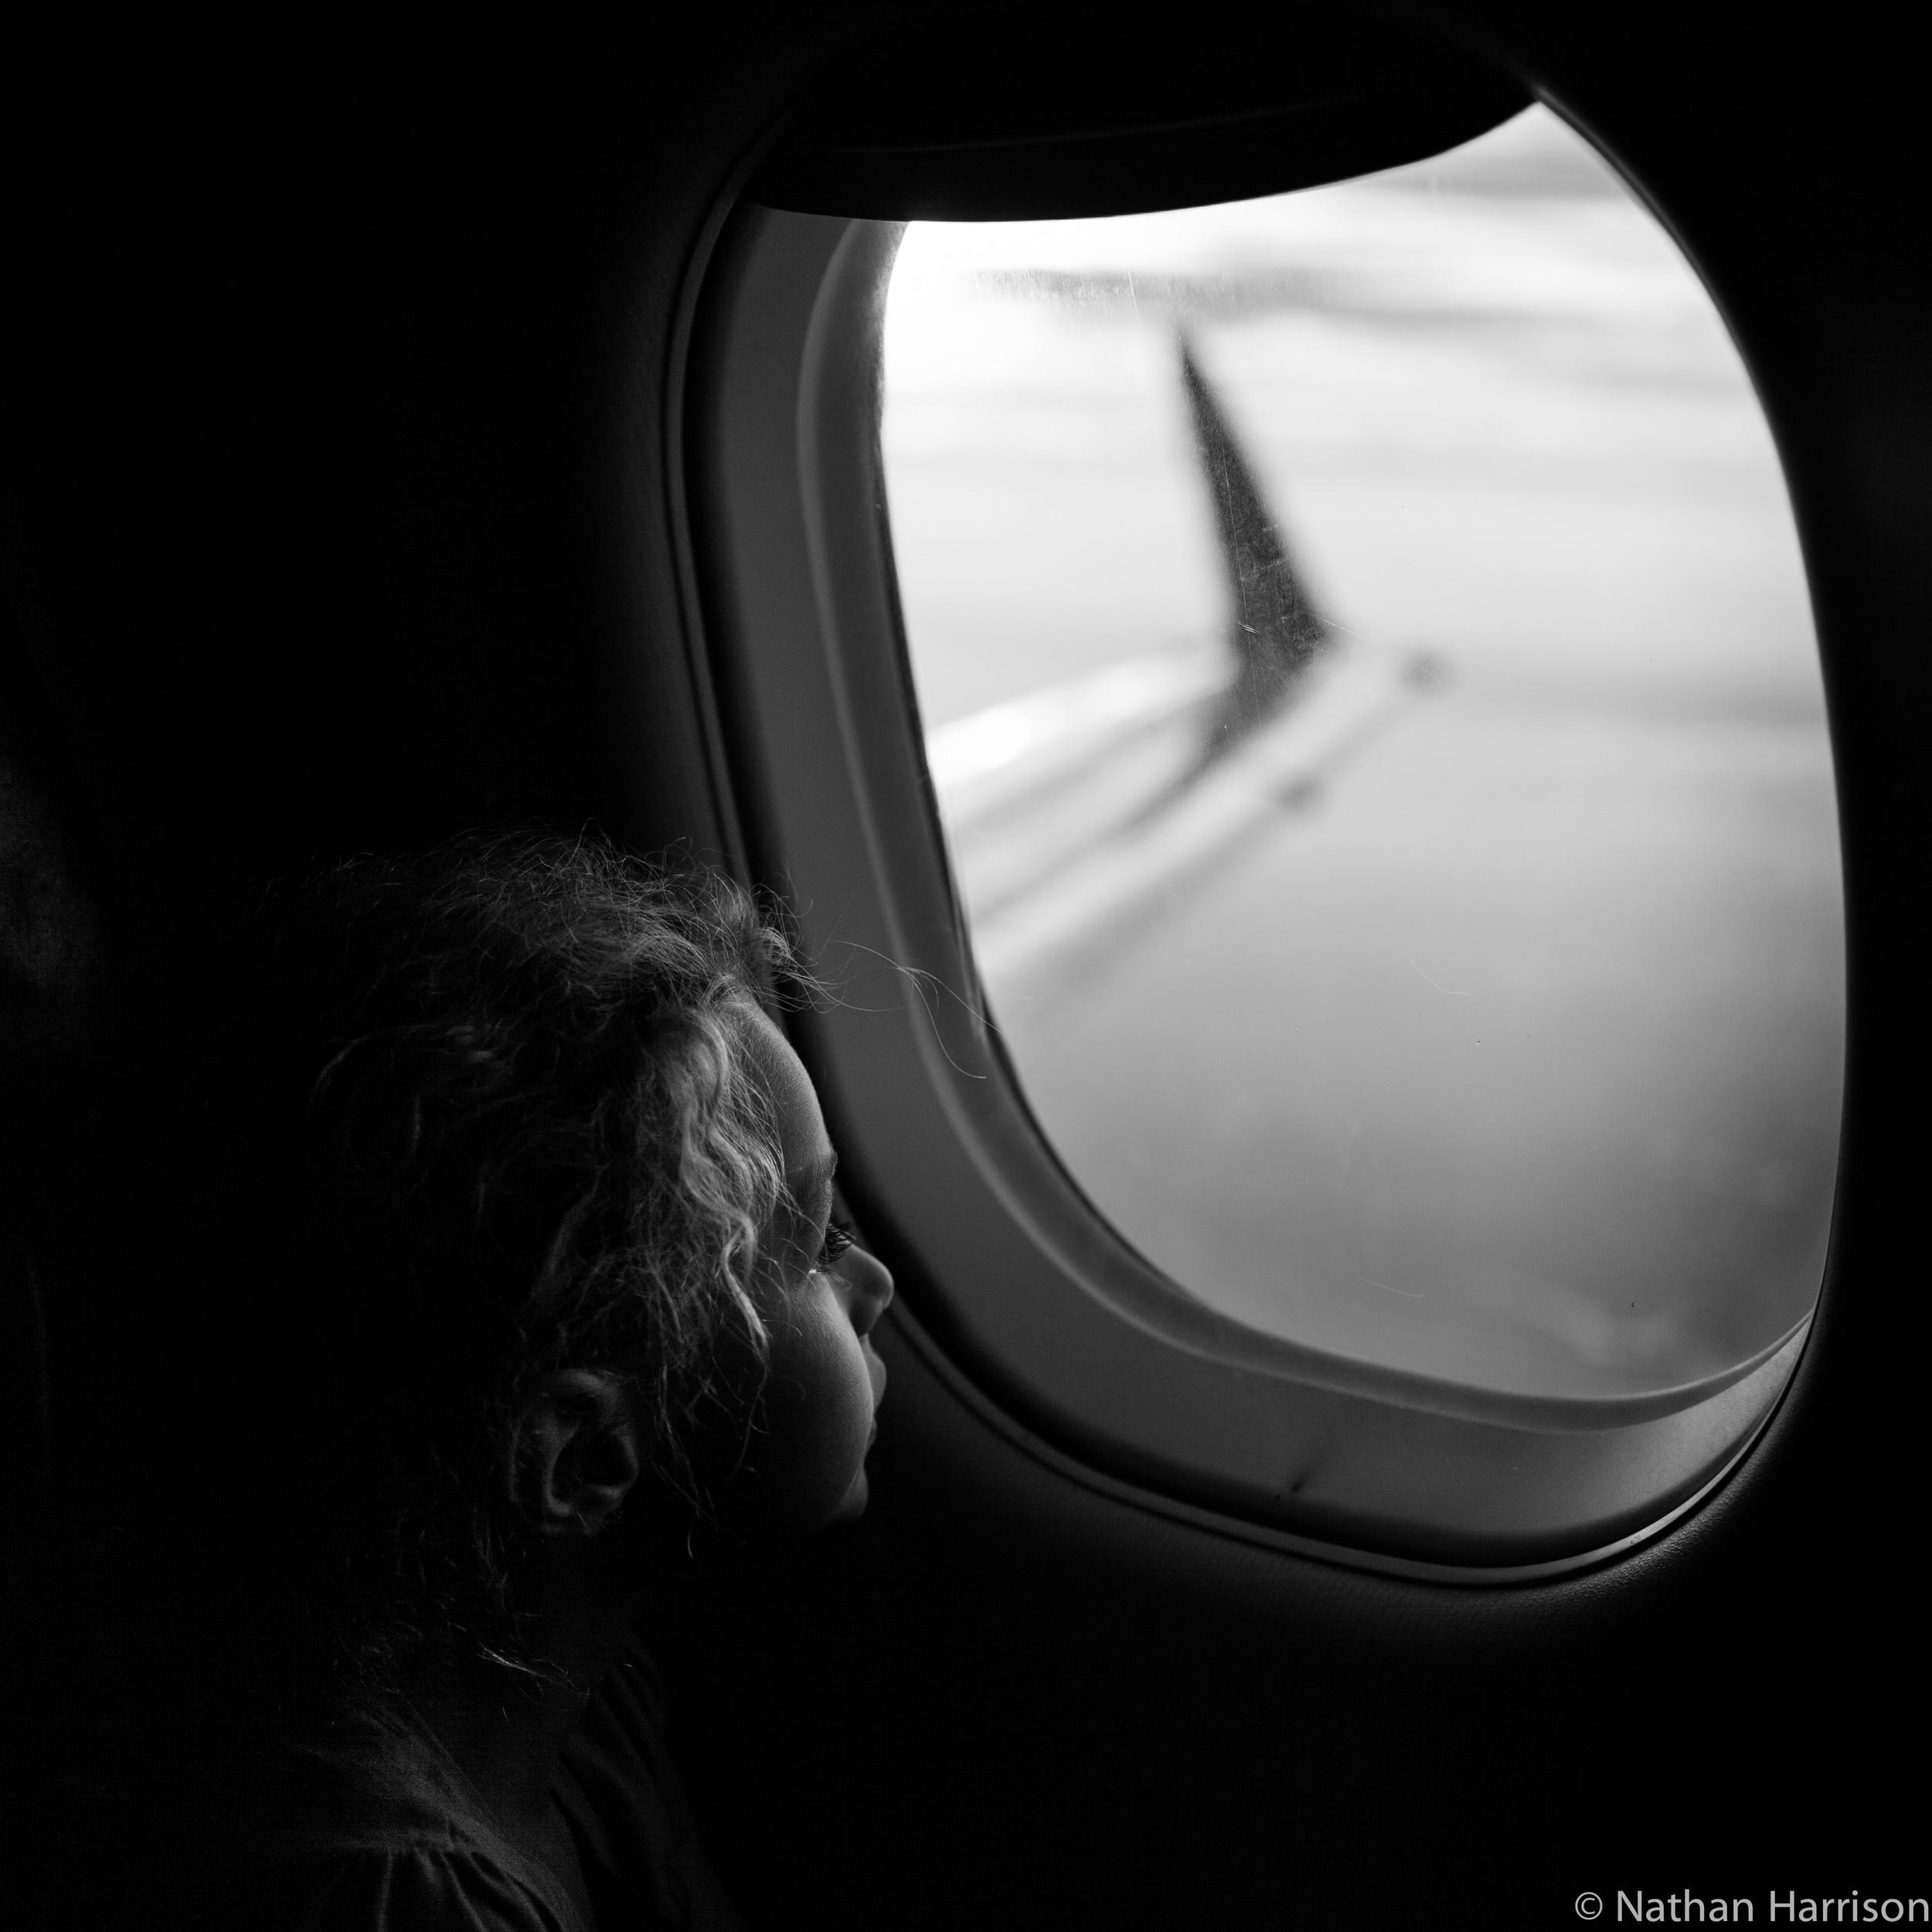 The true joy of flying